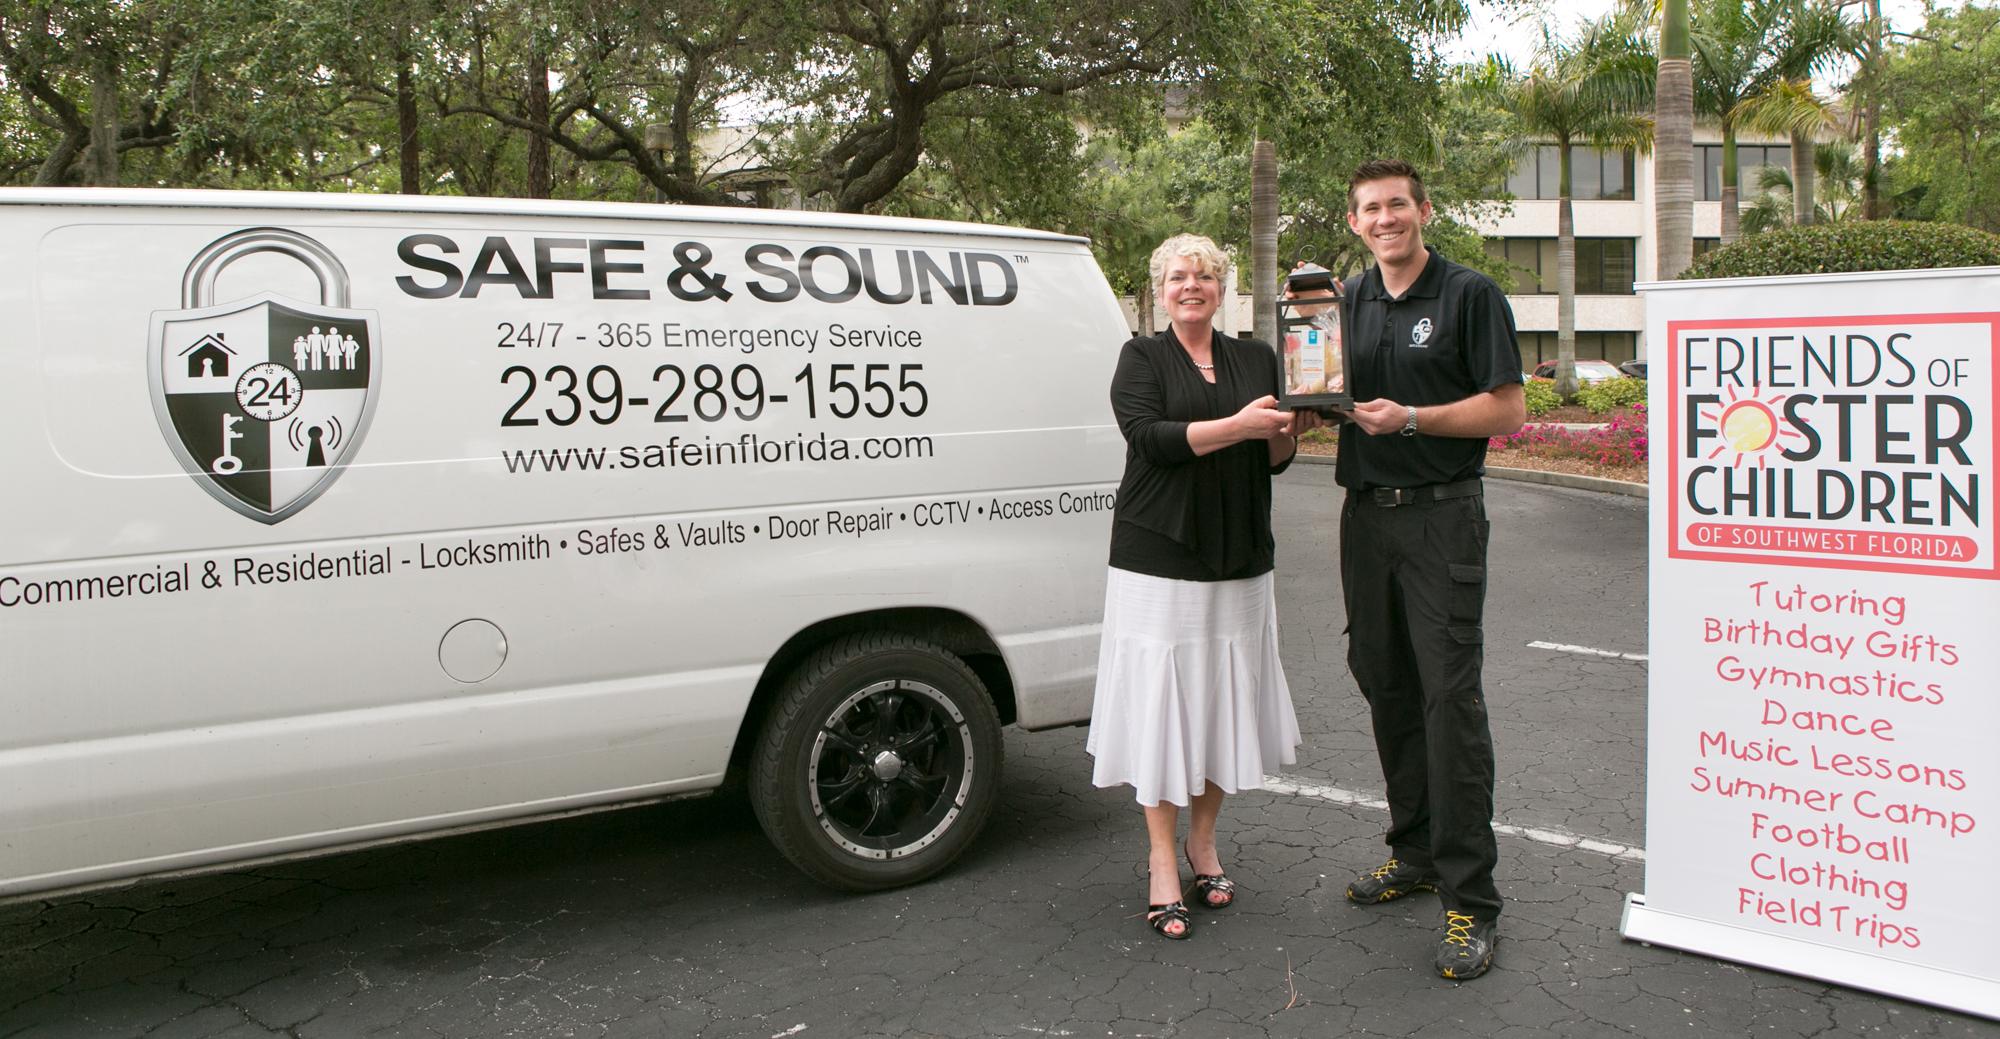 Safe And Sound, Inc. , Friends of Foster Children, Naples, FL